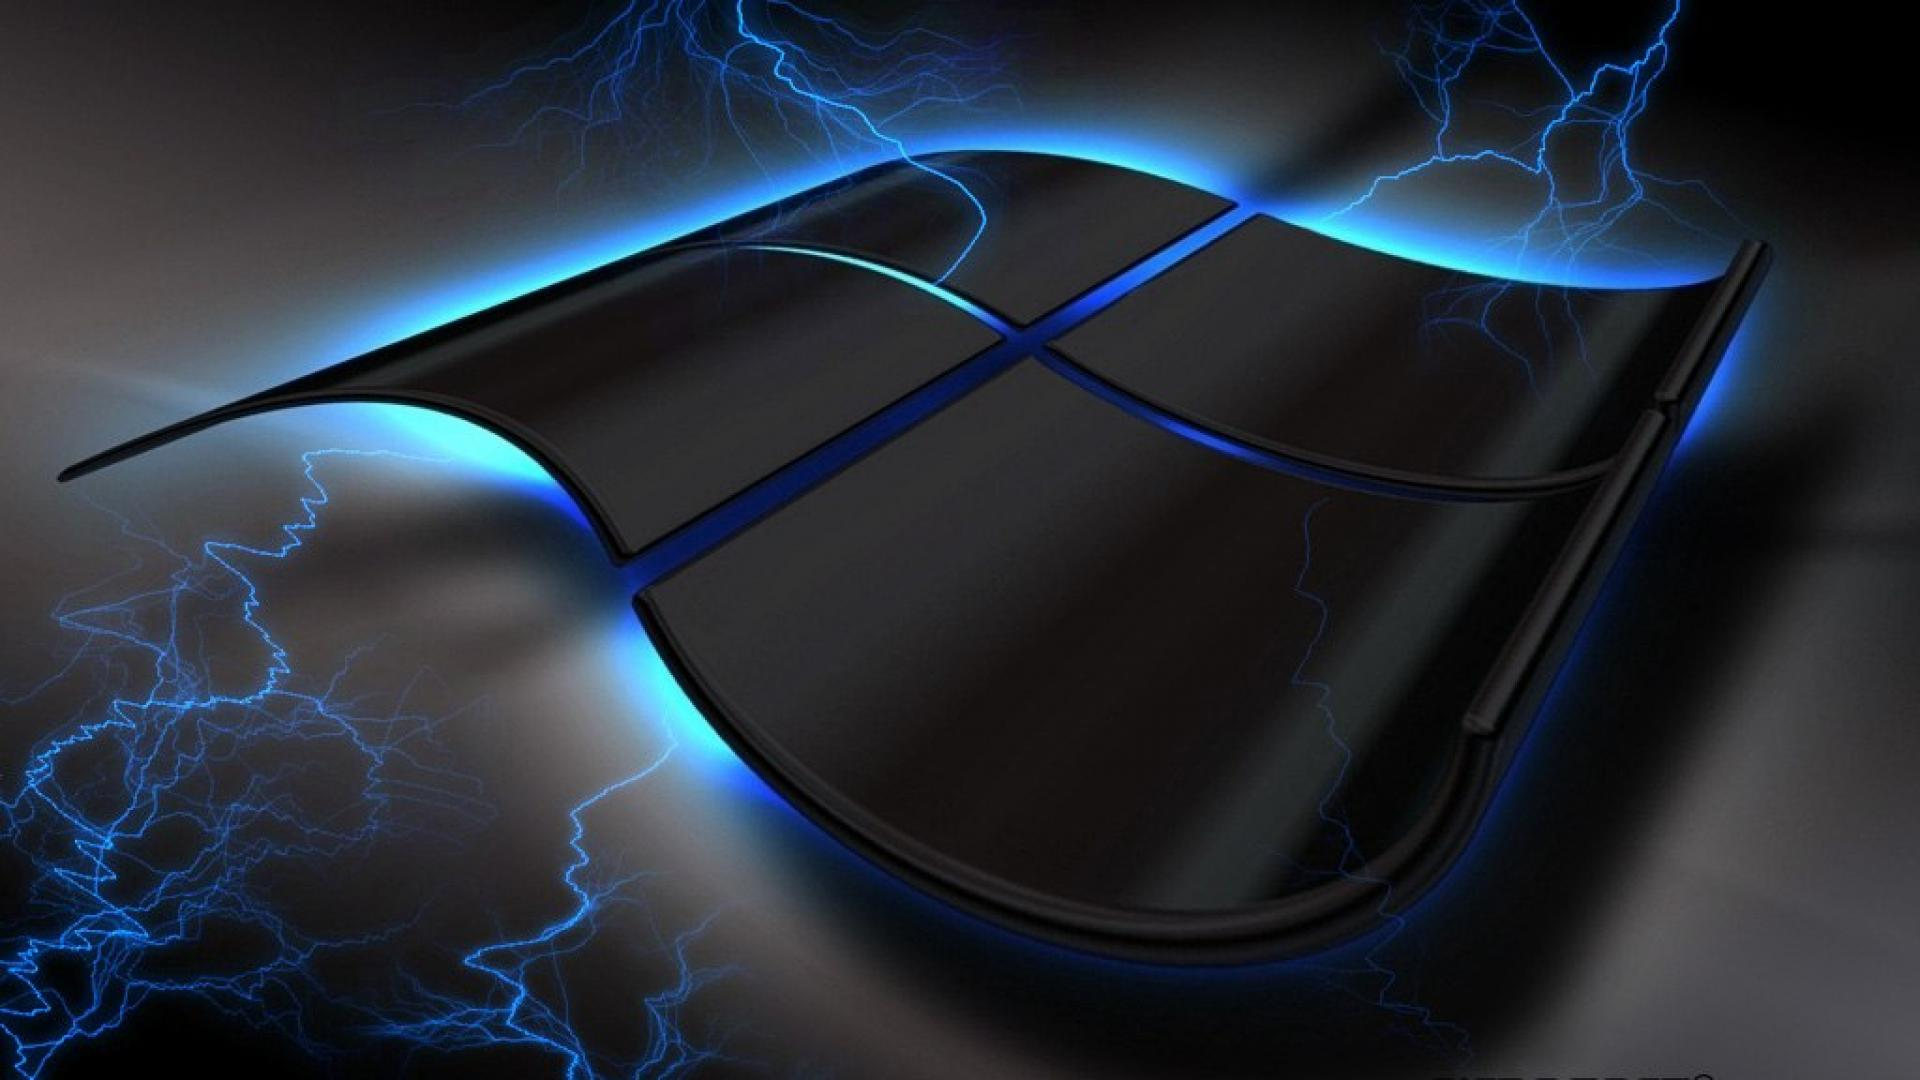 1920x1080 Windows Xp Microsoft HD Wallpaper   1529446 1920x1080